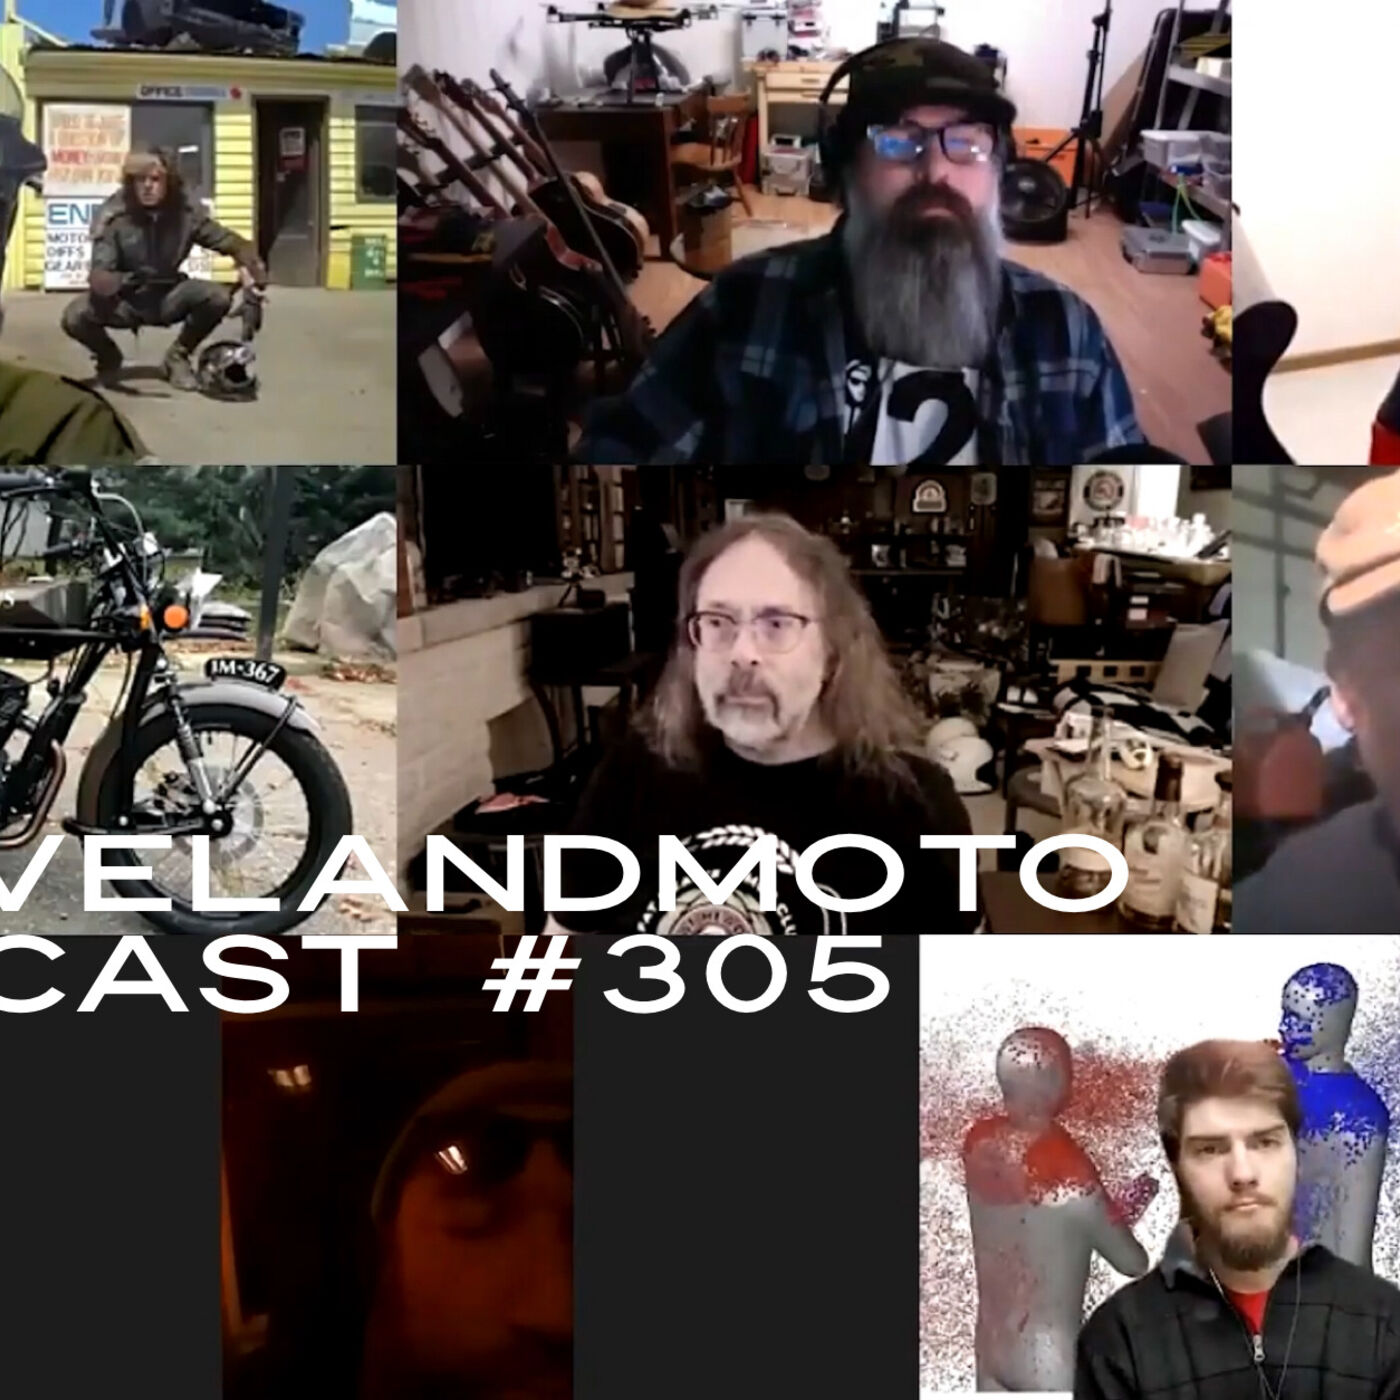 ClevelandMoto Podcast 305 Pokin' at Chris' (j)Anus